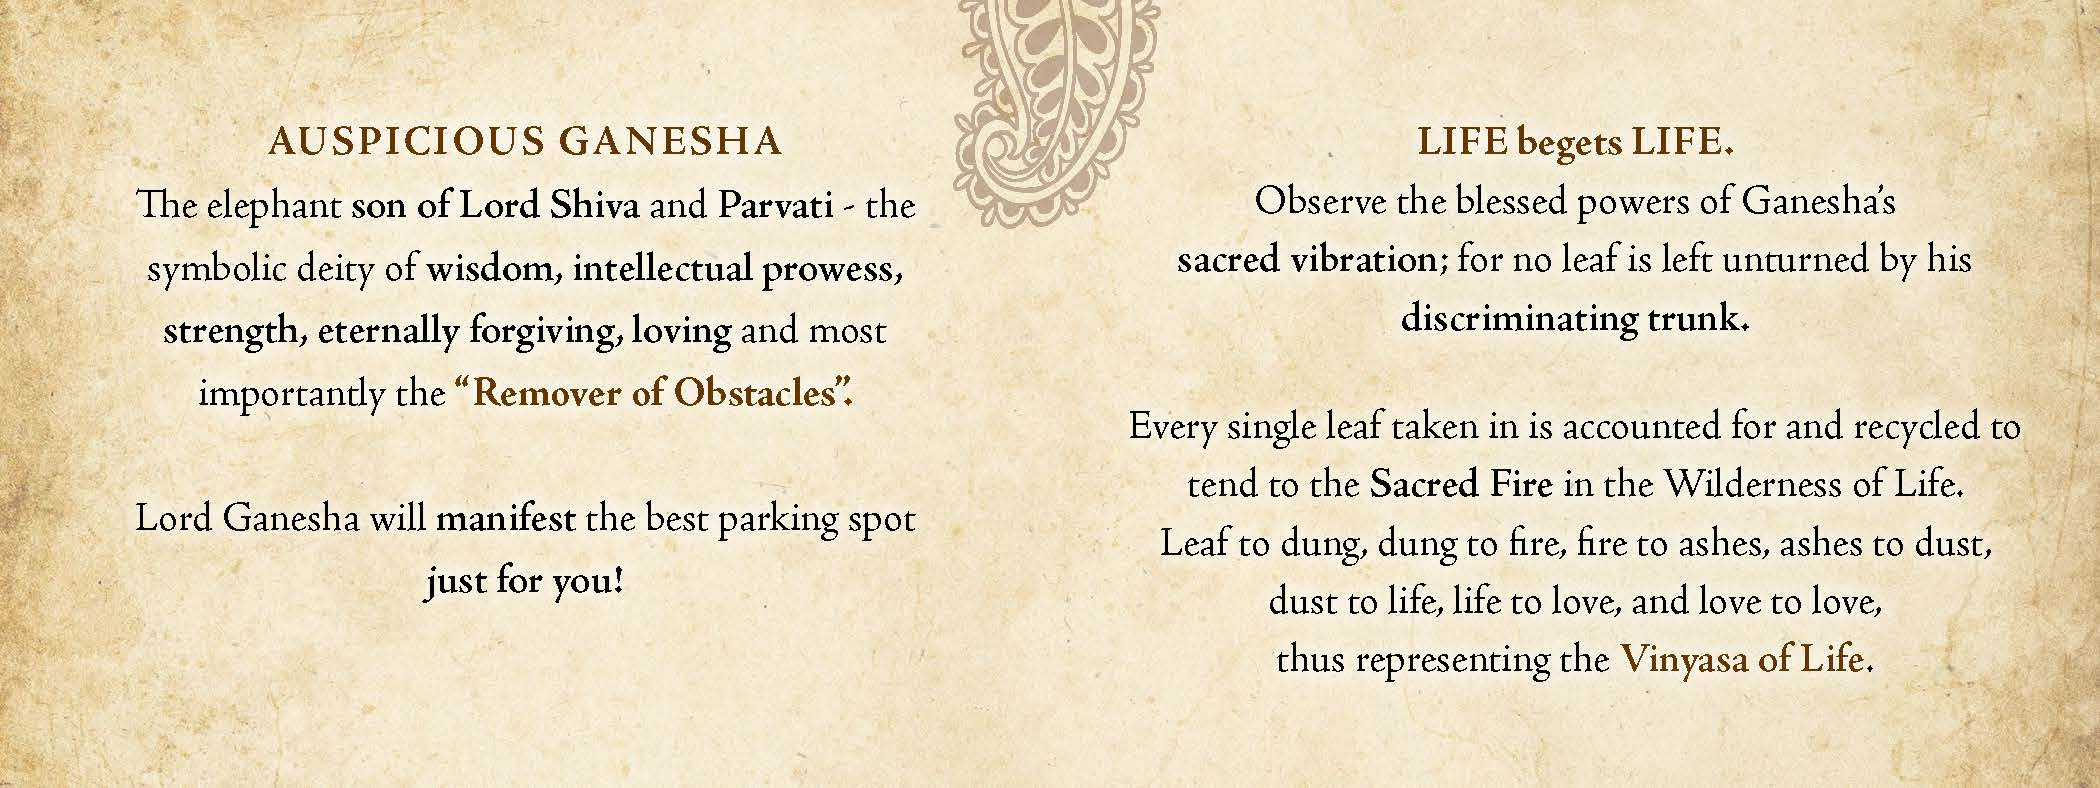 Ganesh final book2_Page_6.jpg